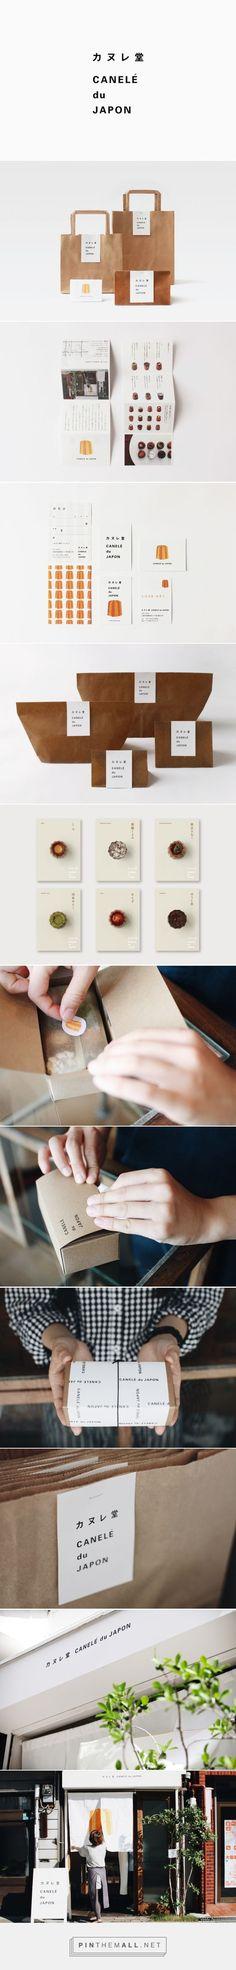 CANELÉ du JAPON – 大阪のブランディングデザイン事務所 8otto - created via https://pinthemall.net: